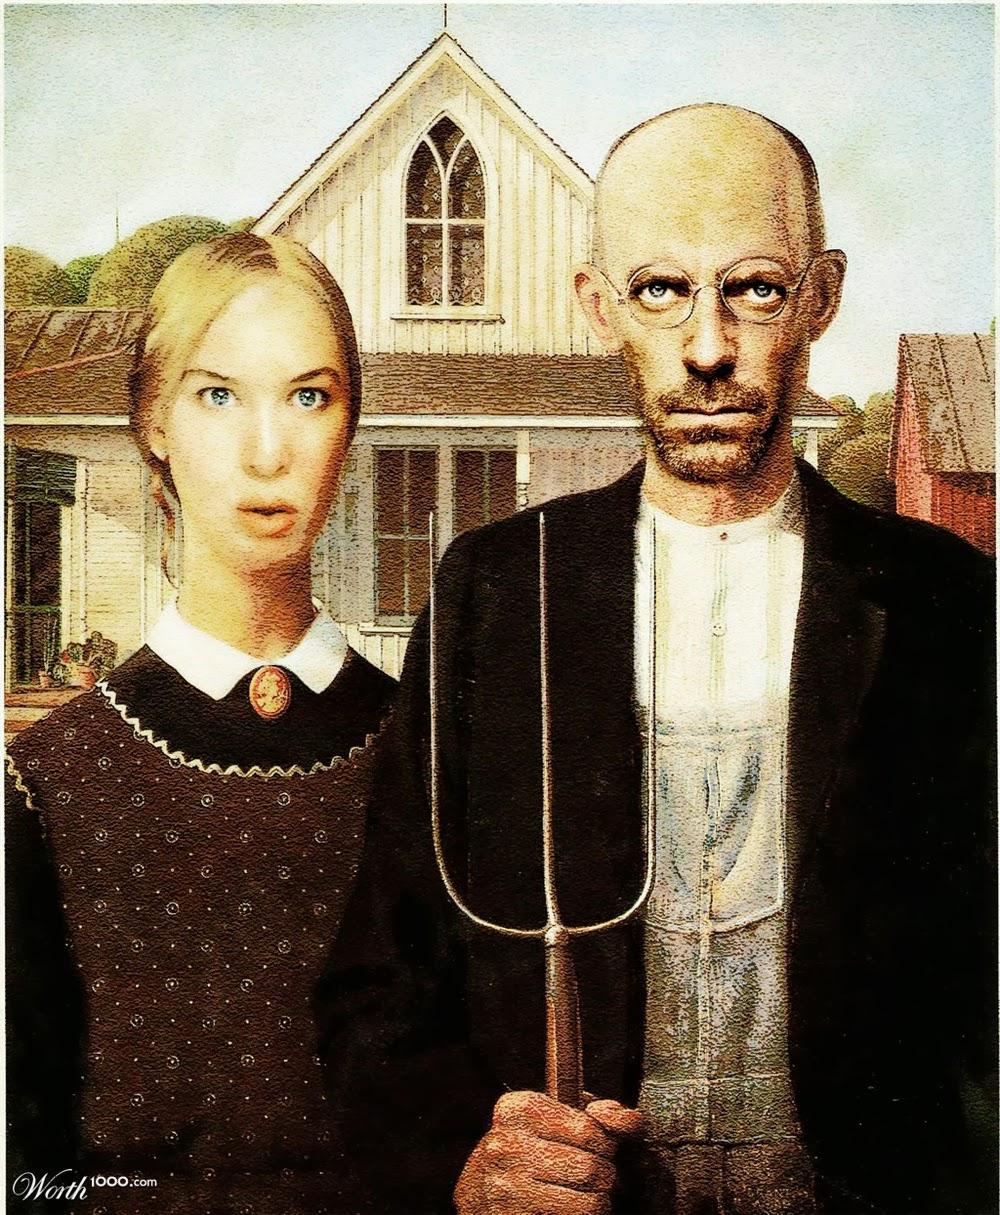 21-Renee-Zellweger-and-Hugh-Laurie-by-chanmart-Worth-1000-www-designstack-co